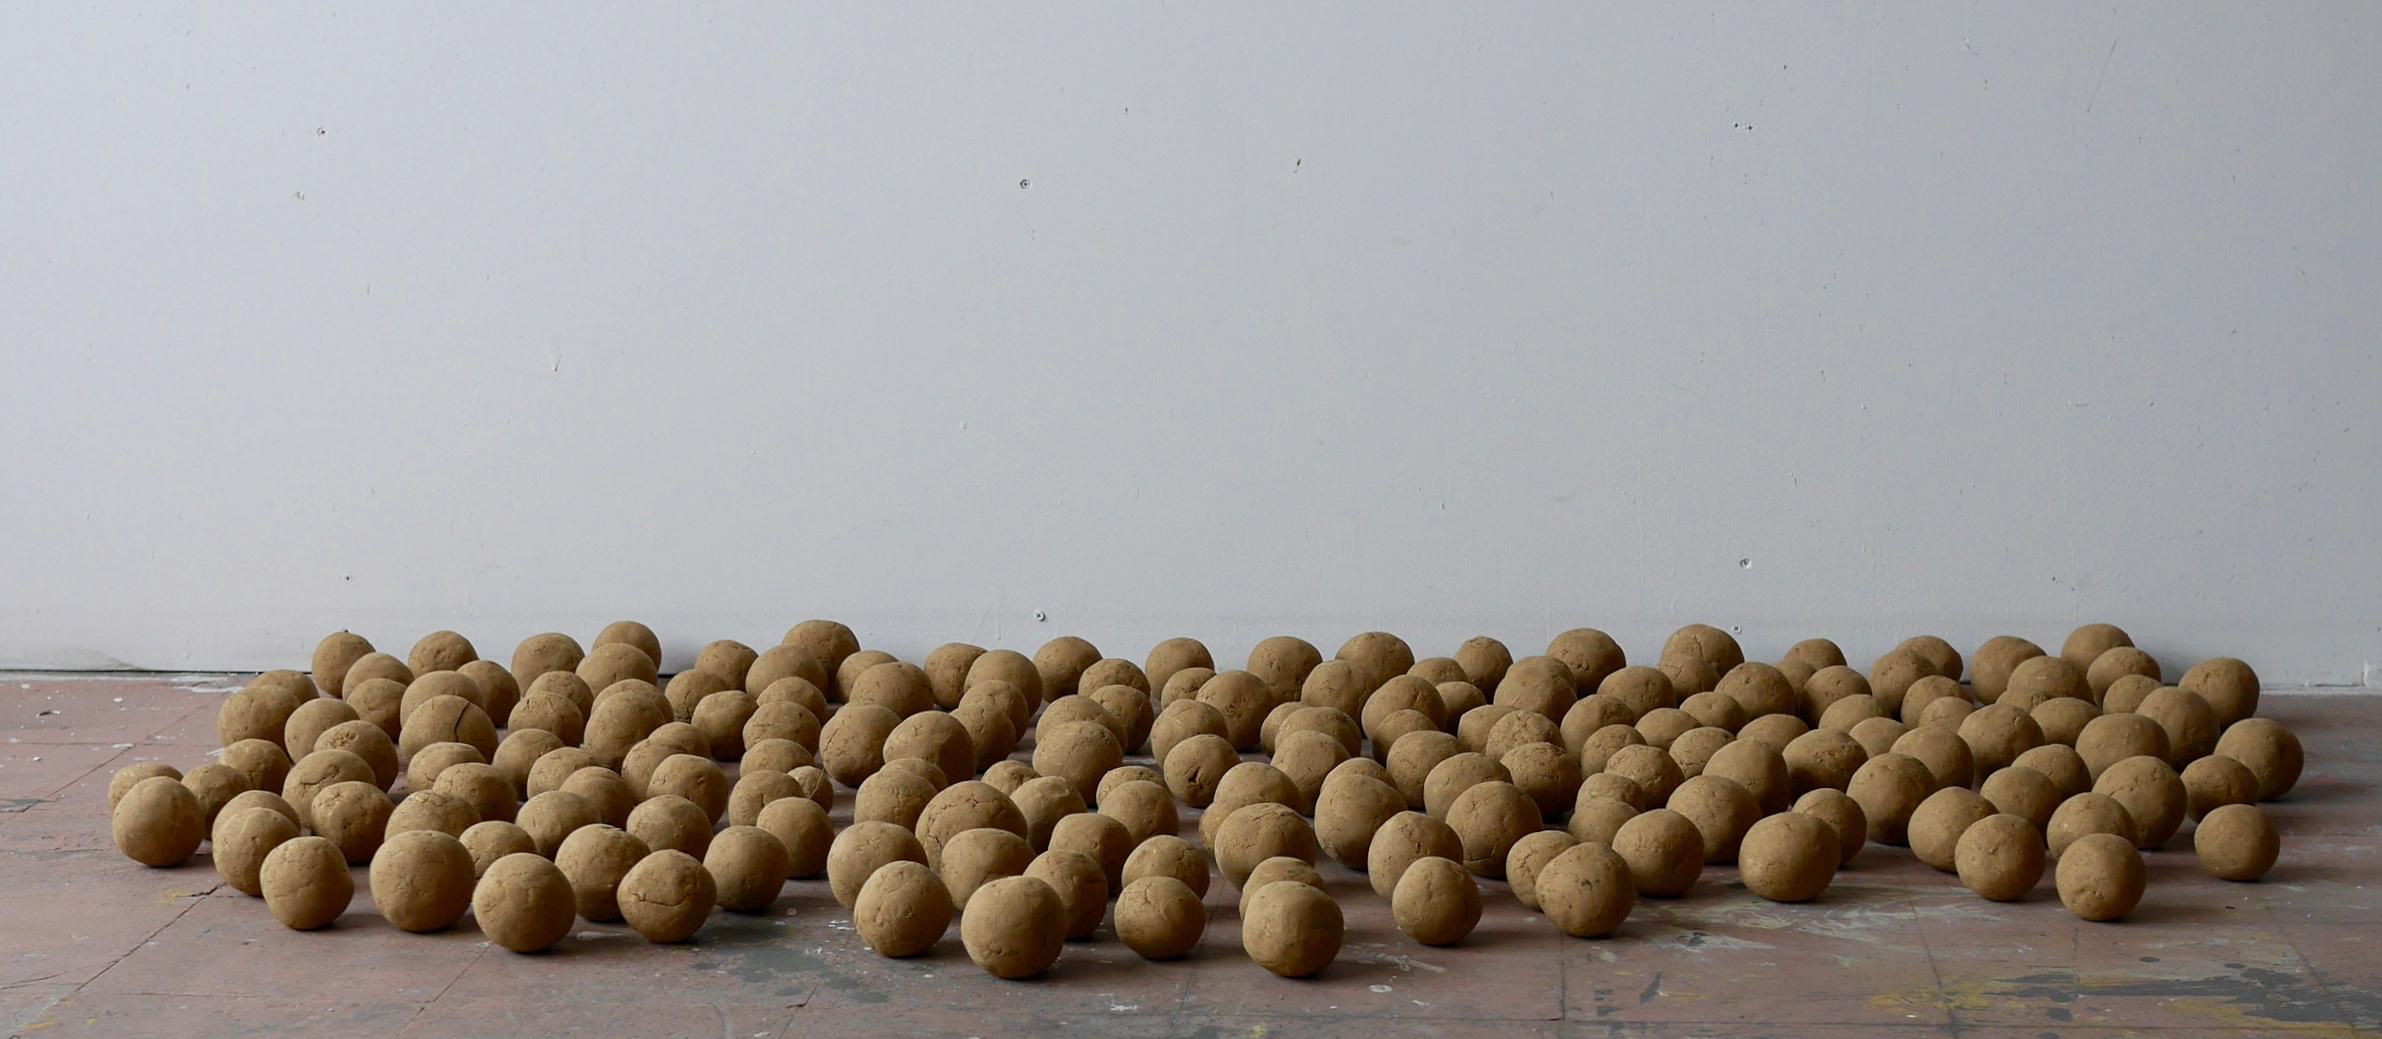 Self-portrait, 171 Dirt Balls - detail 2